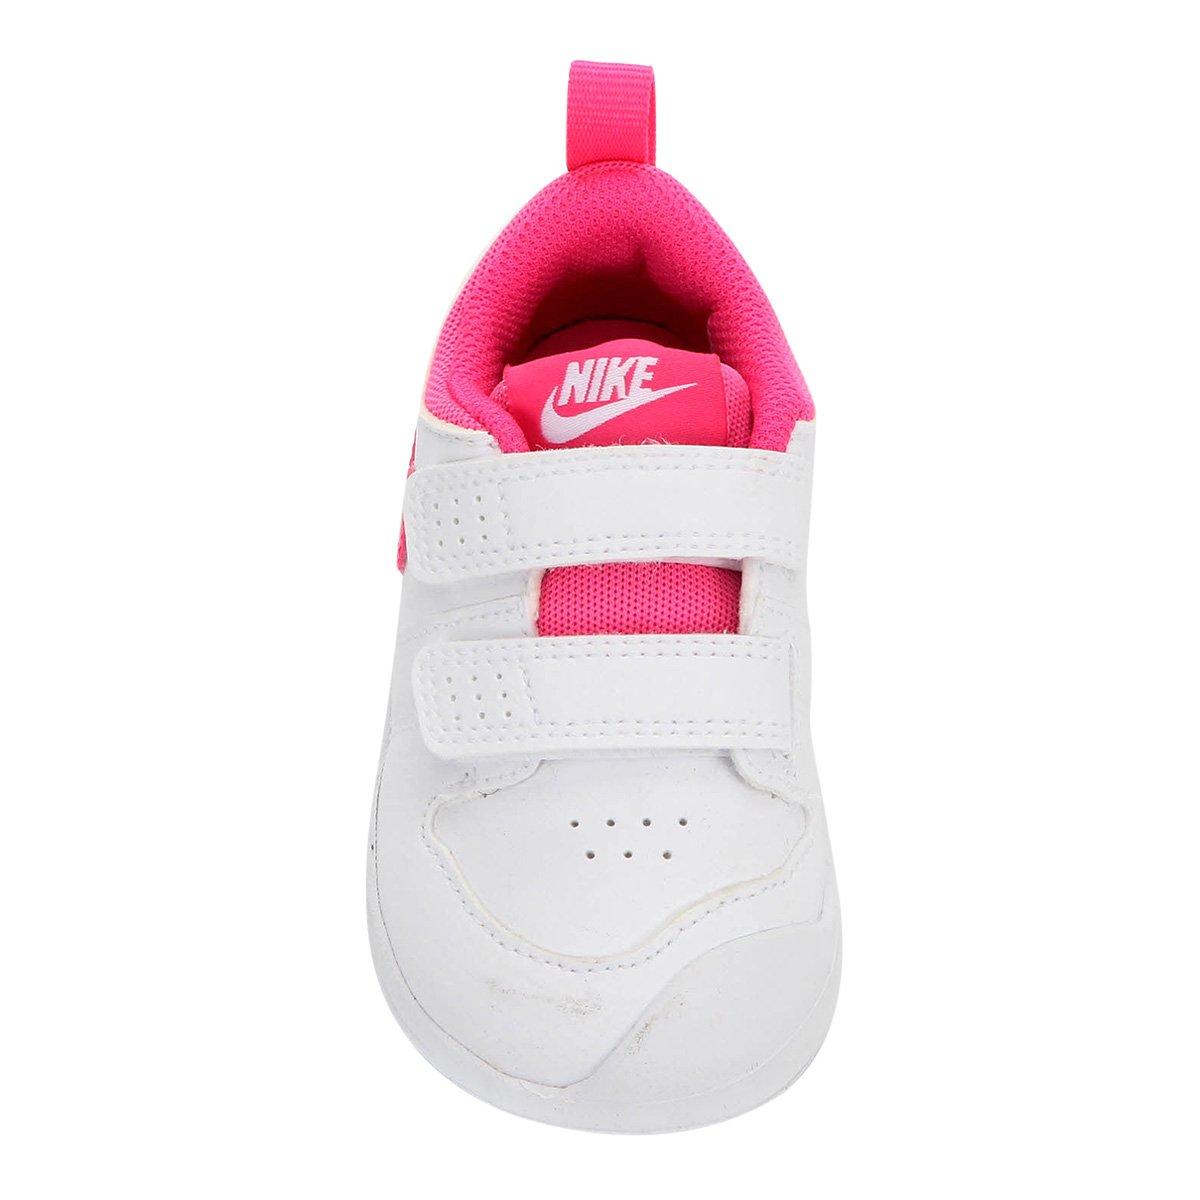 Tênis Infantil Nike Pico 5 Velcro - Tam: 24 - 2